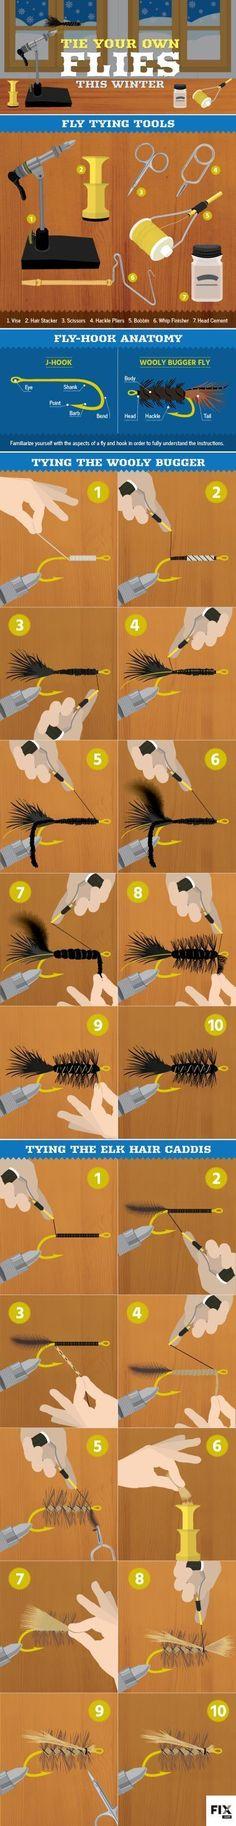 The Umpqua Beginner Fly Tying Kit is all you need to start tying. #Fishing101